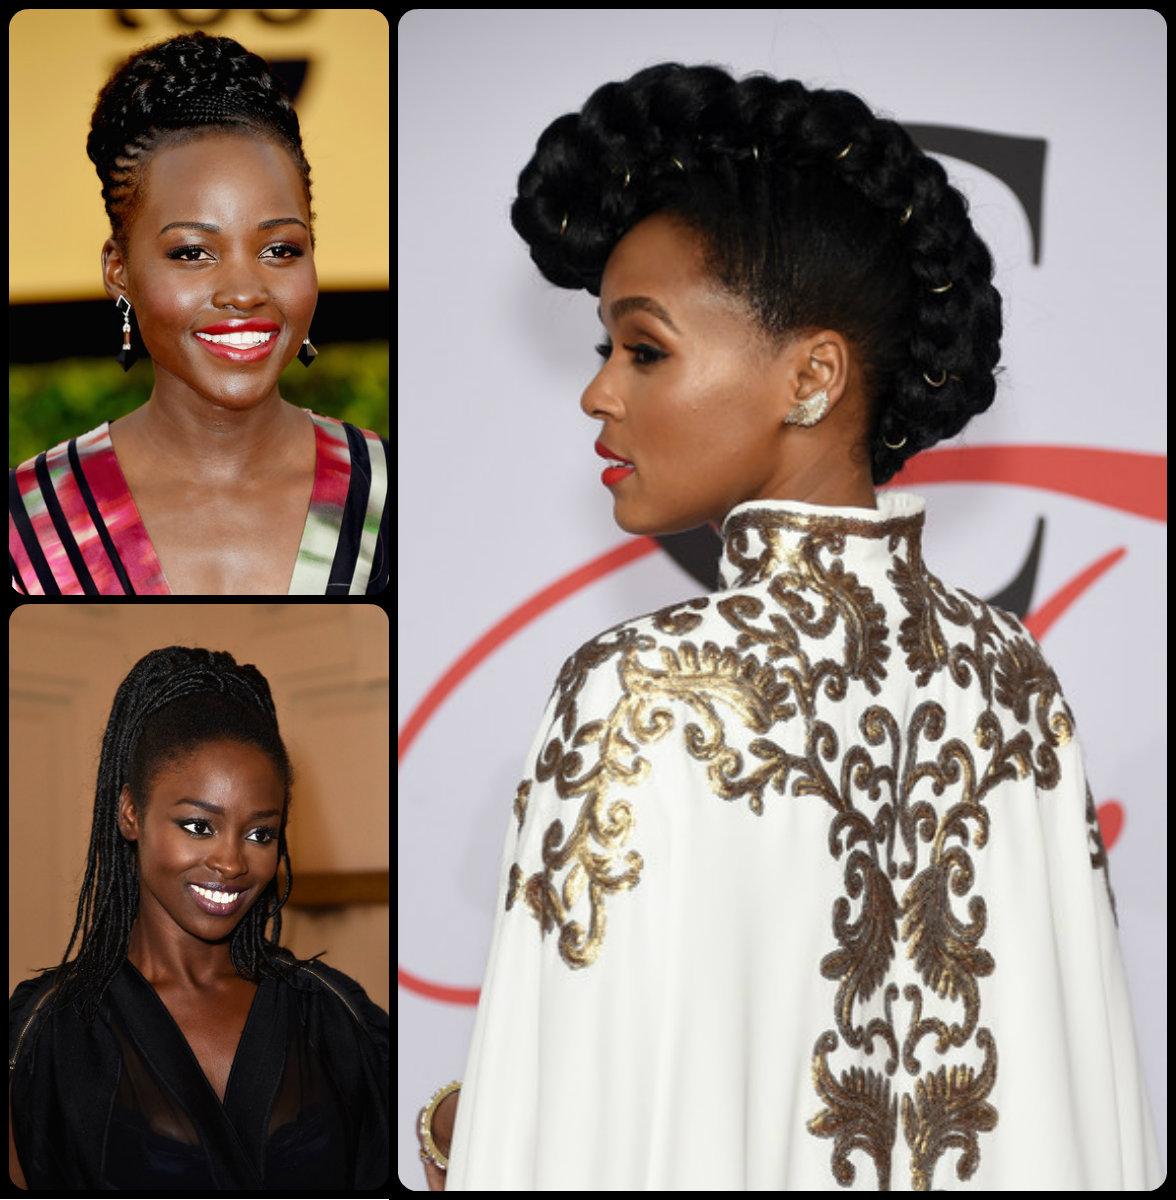 Miraculous Black Women Braided Updos 2015 Summer Hairstyles 2016 Hair Hairstyles For Women Draintrainus